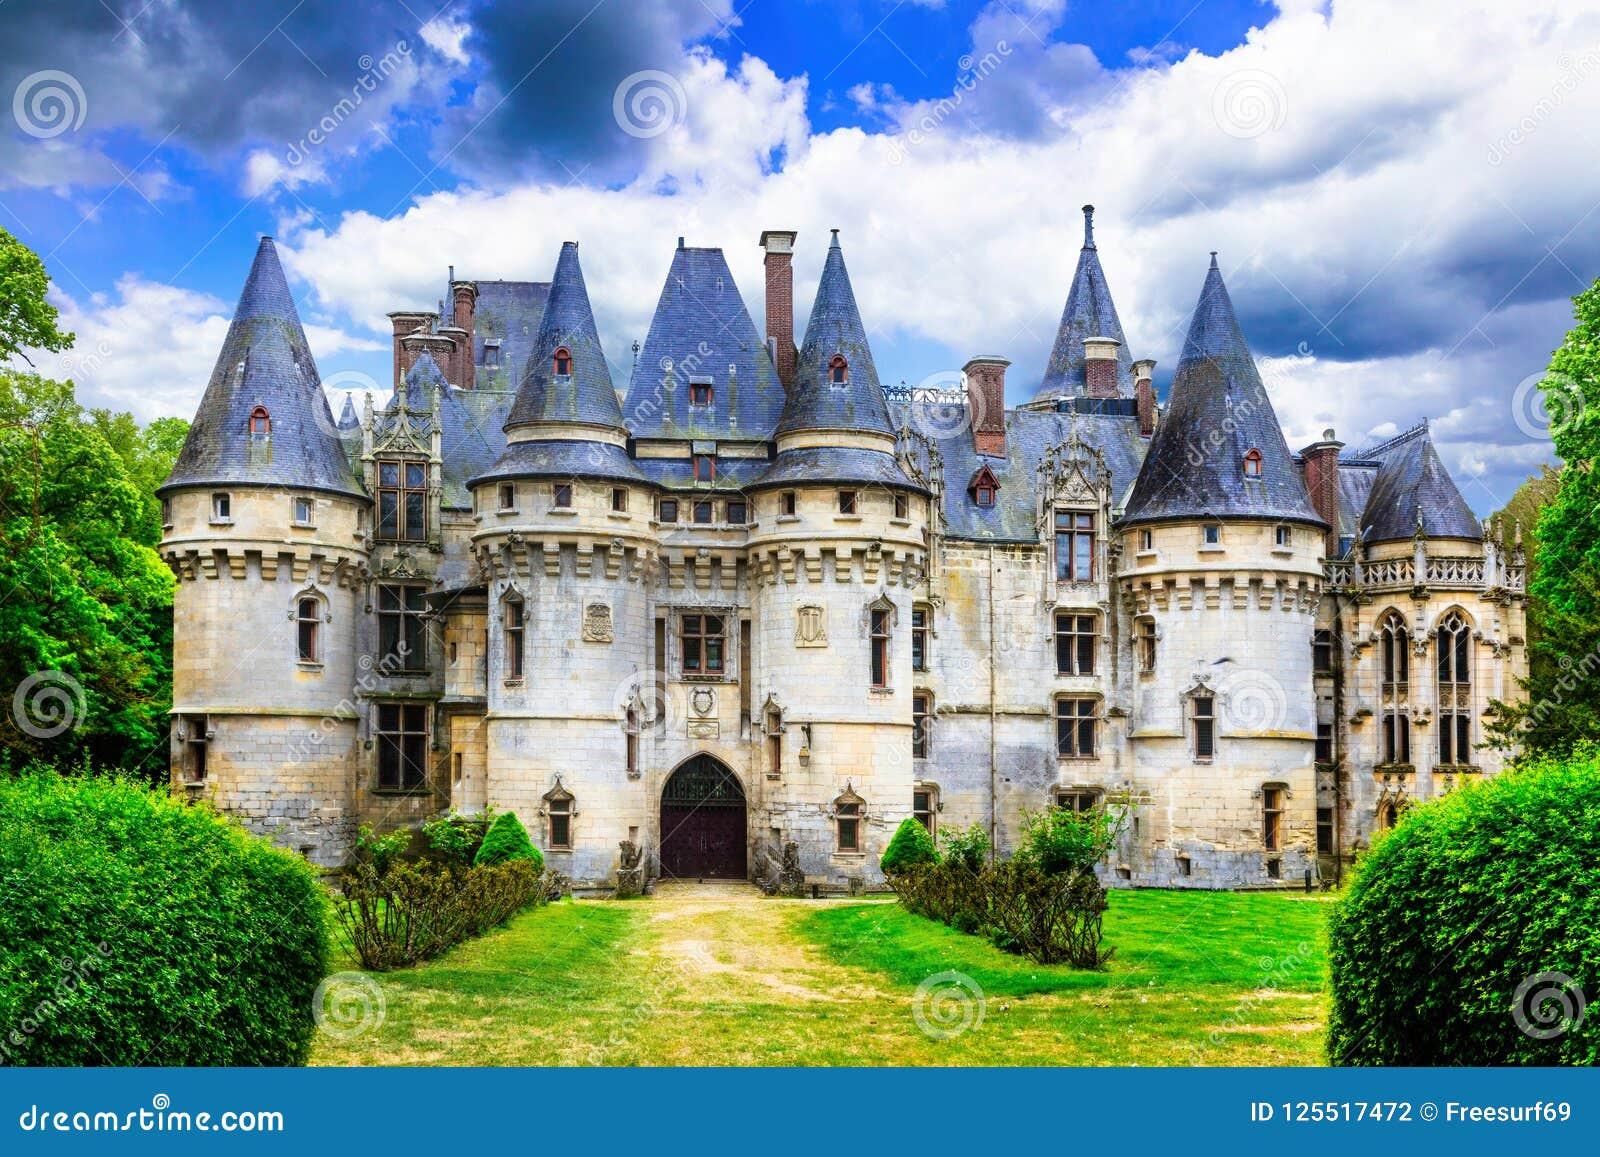 Mysterious fairy-tale castles. Chateau de vigny, France